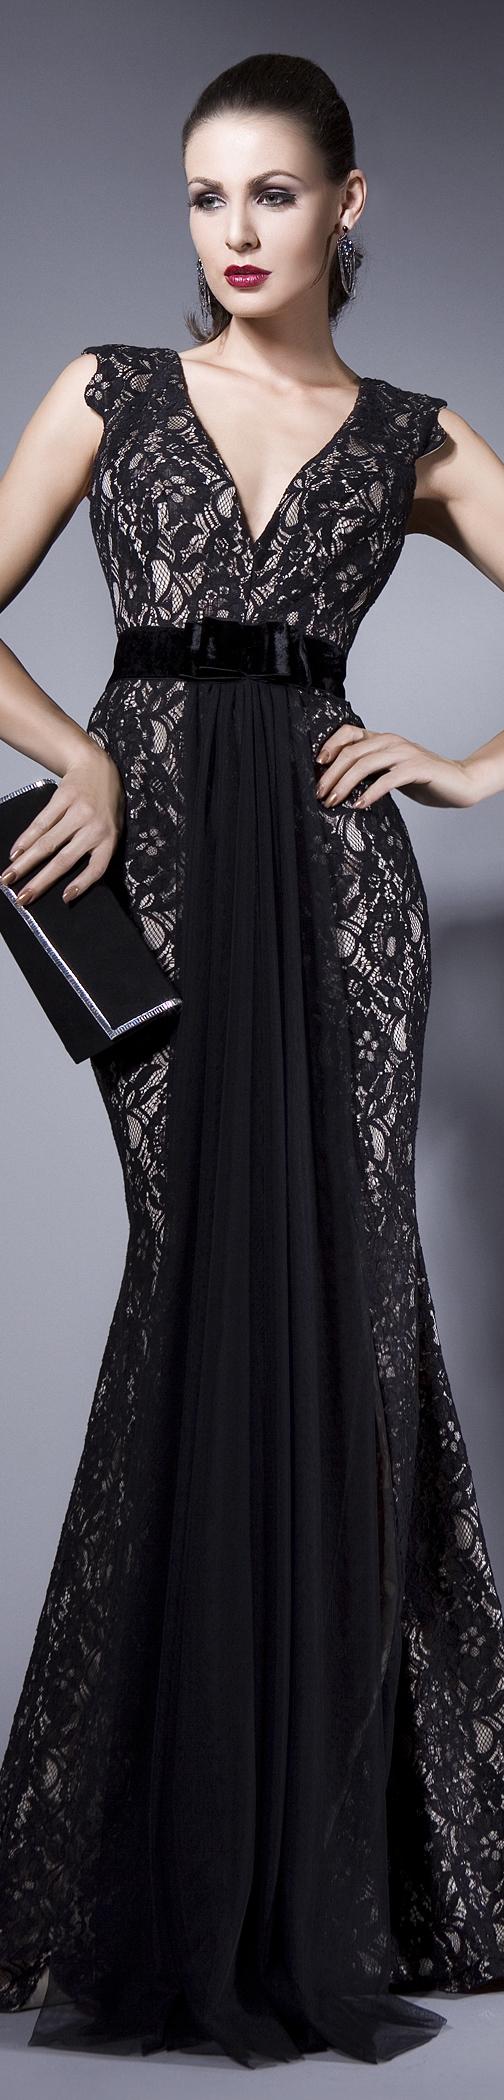 Queen of heart collection fall in love rochie de seara design